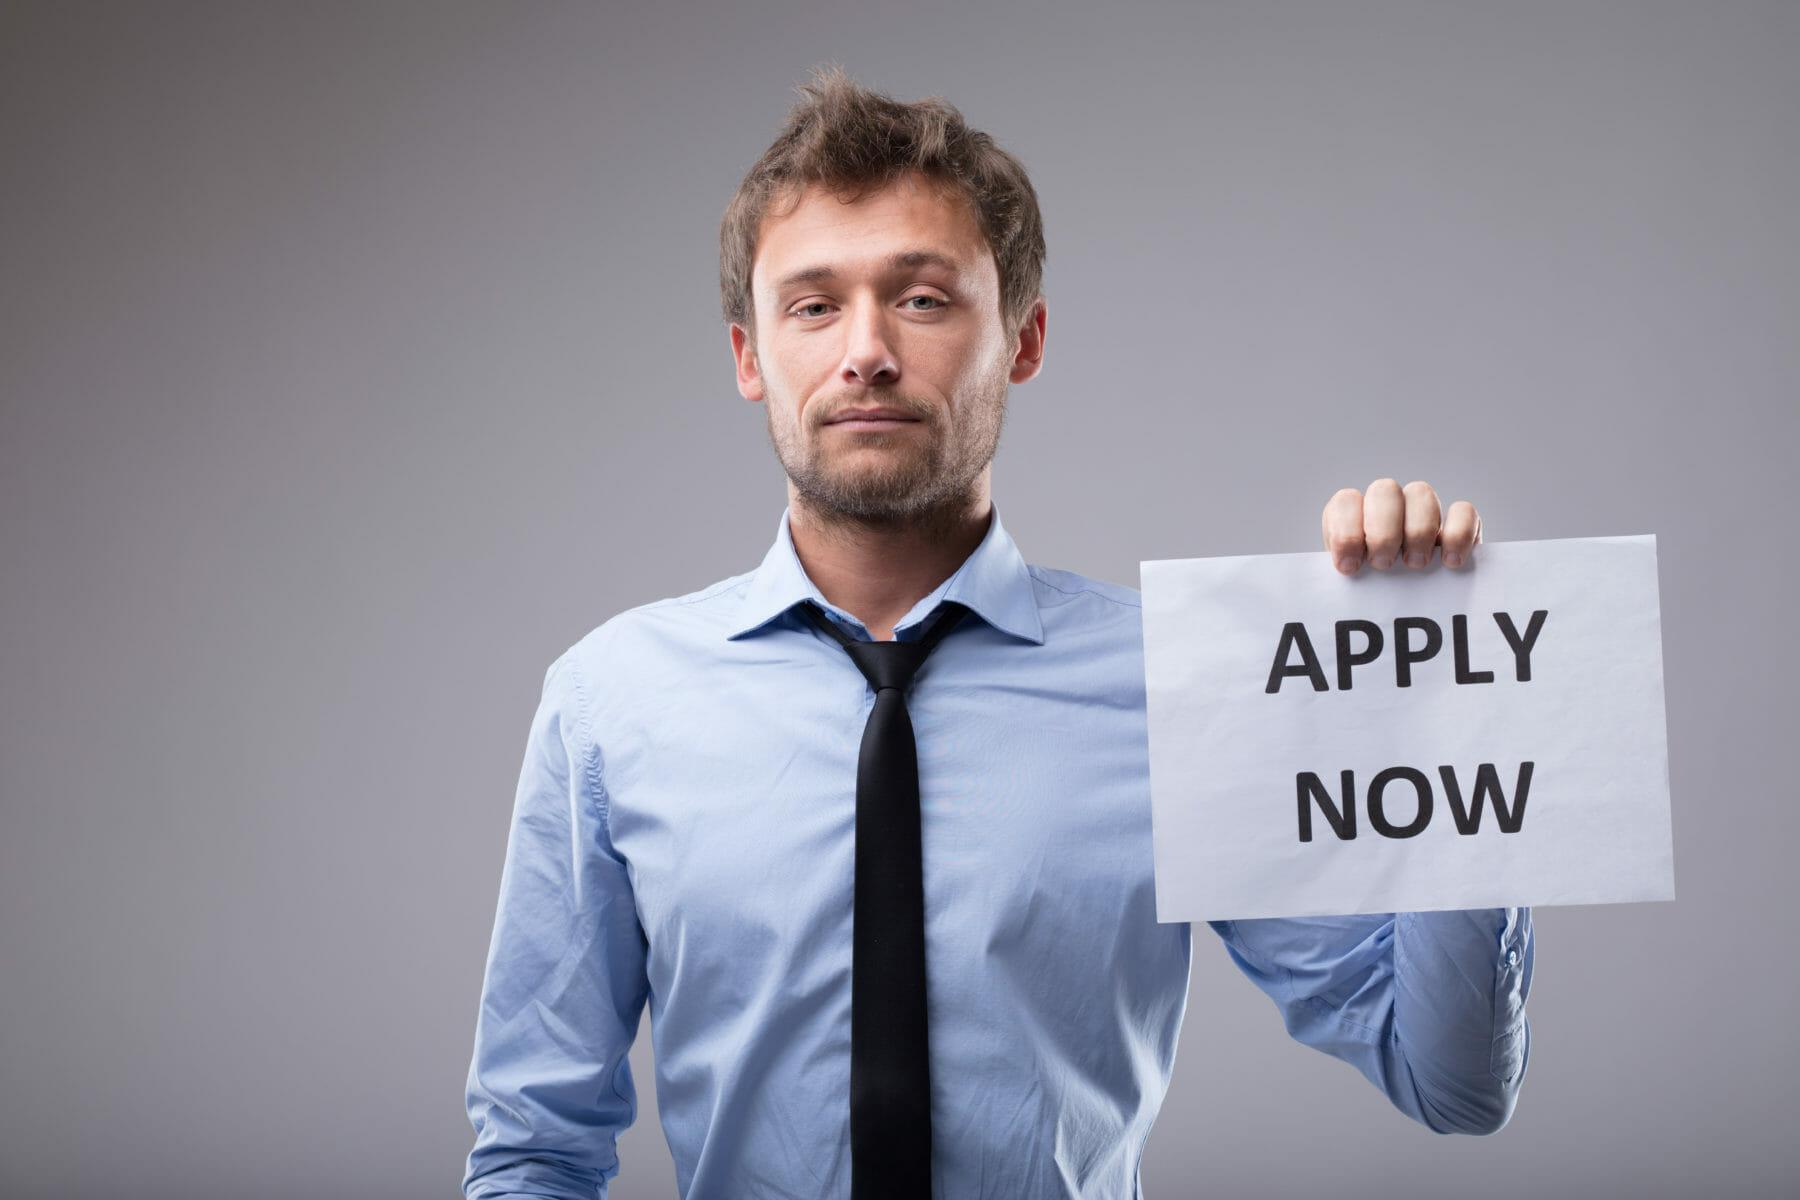 List of Top Automotive Employers - Job Seekers Blog - JobStars Resume Writing Services